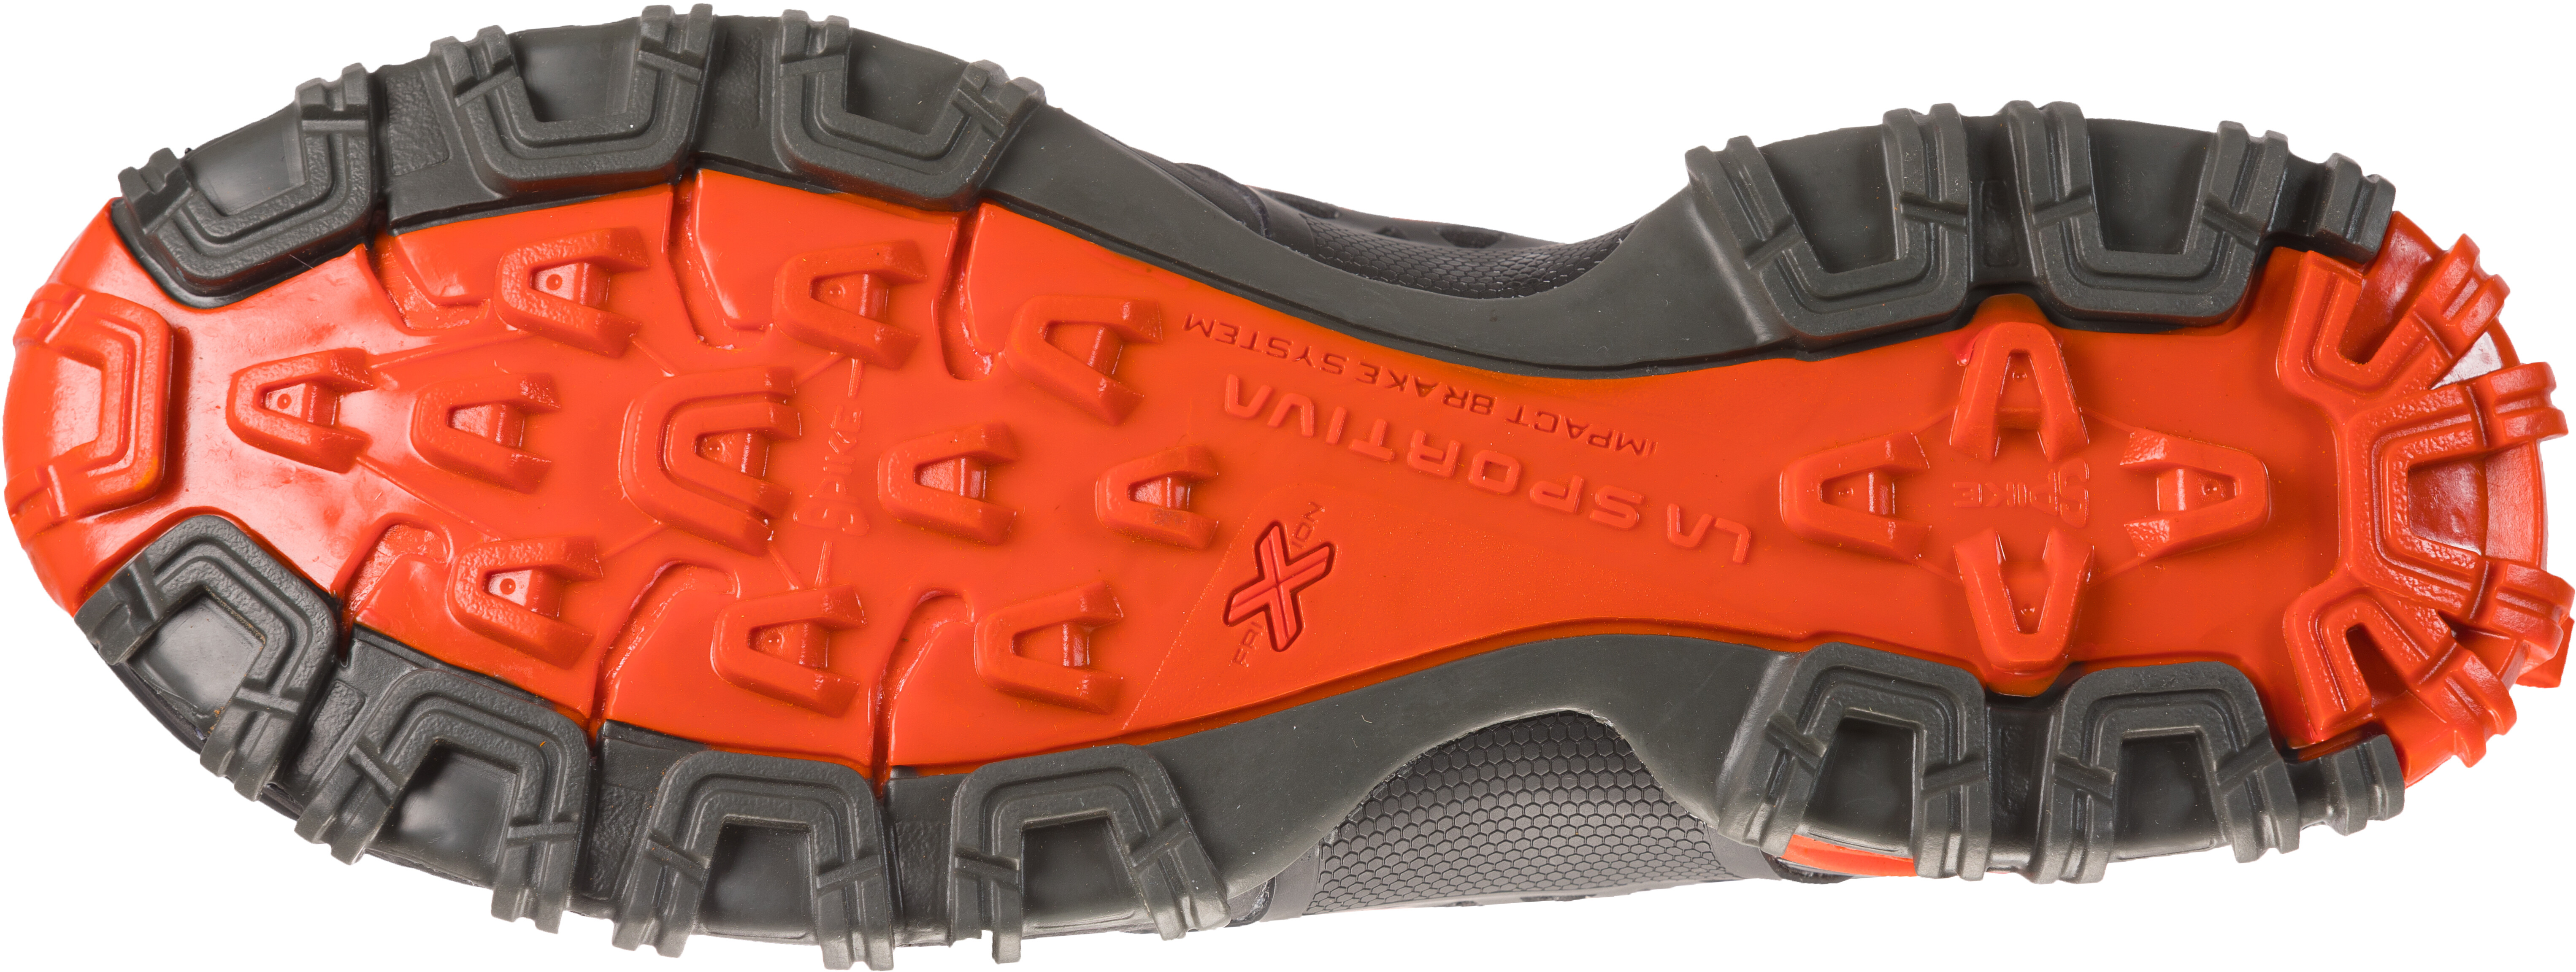 La Sportiva Bushido II - Zapatillas running Hombre - naranja negro ... ab3a3ba3705